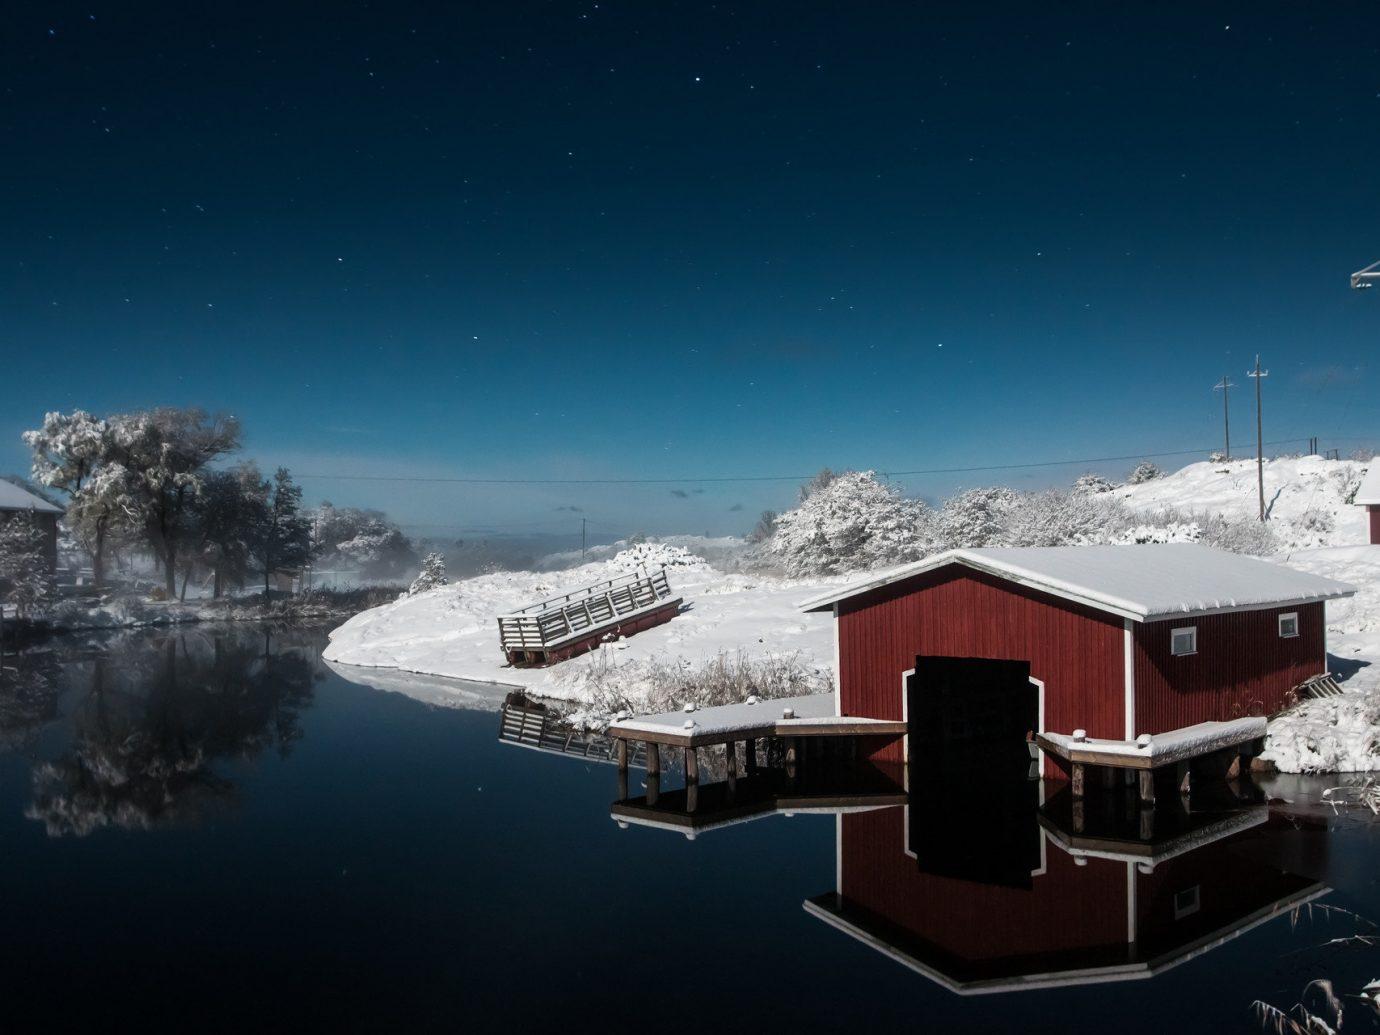 Finland Trip Ideas sky outdoor snow night Winter weather Nature screenshot moonlight arctic shore